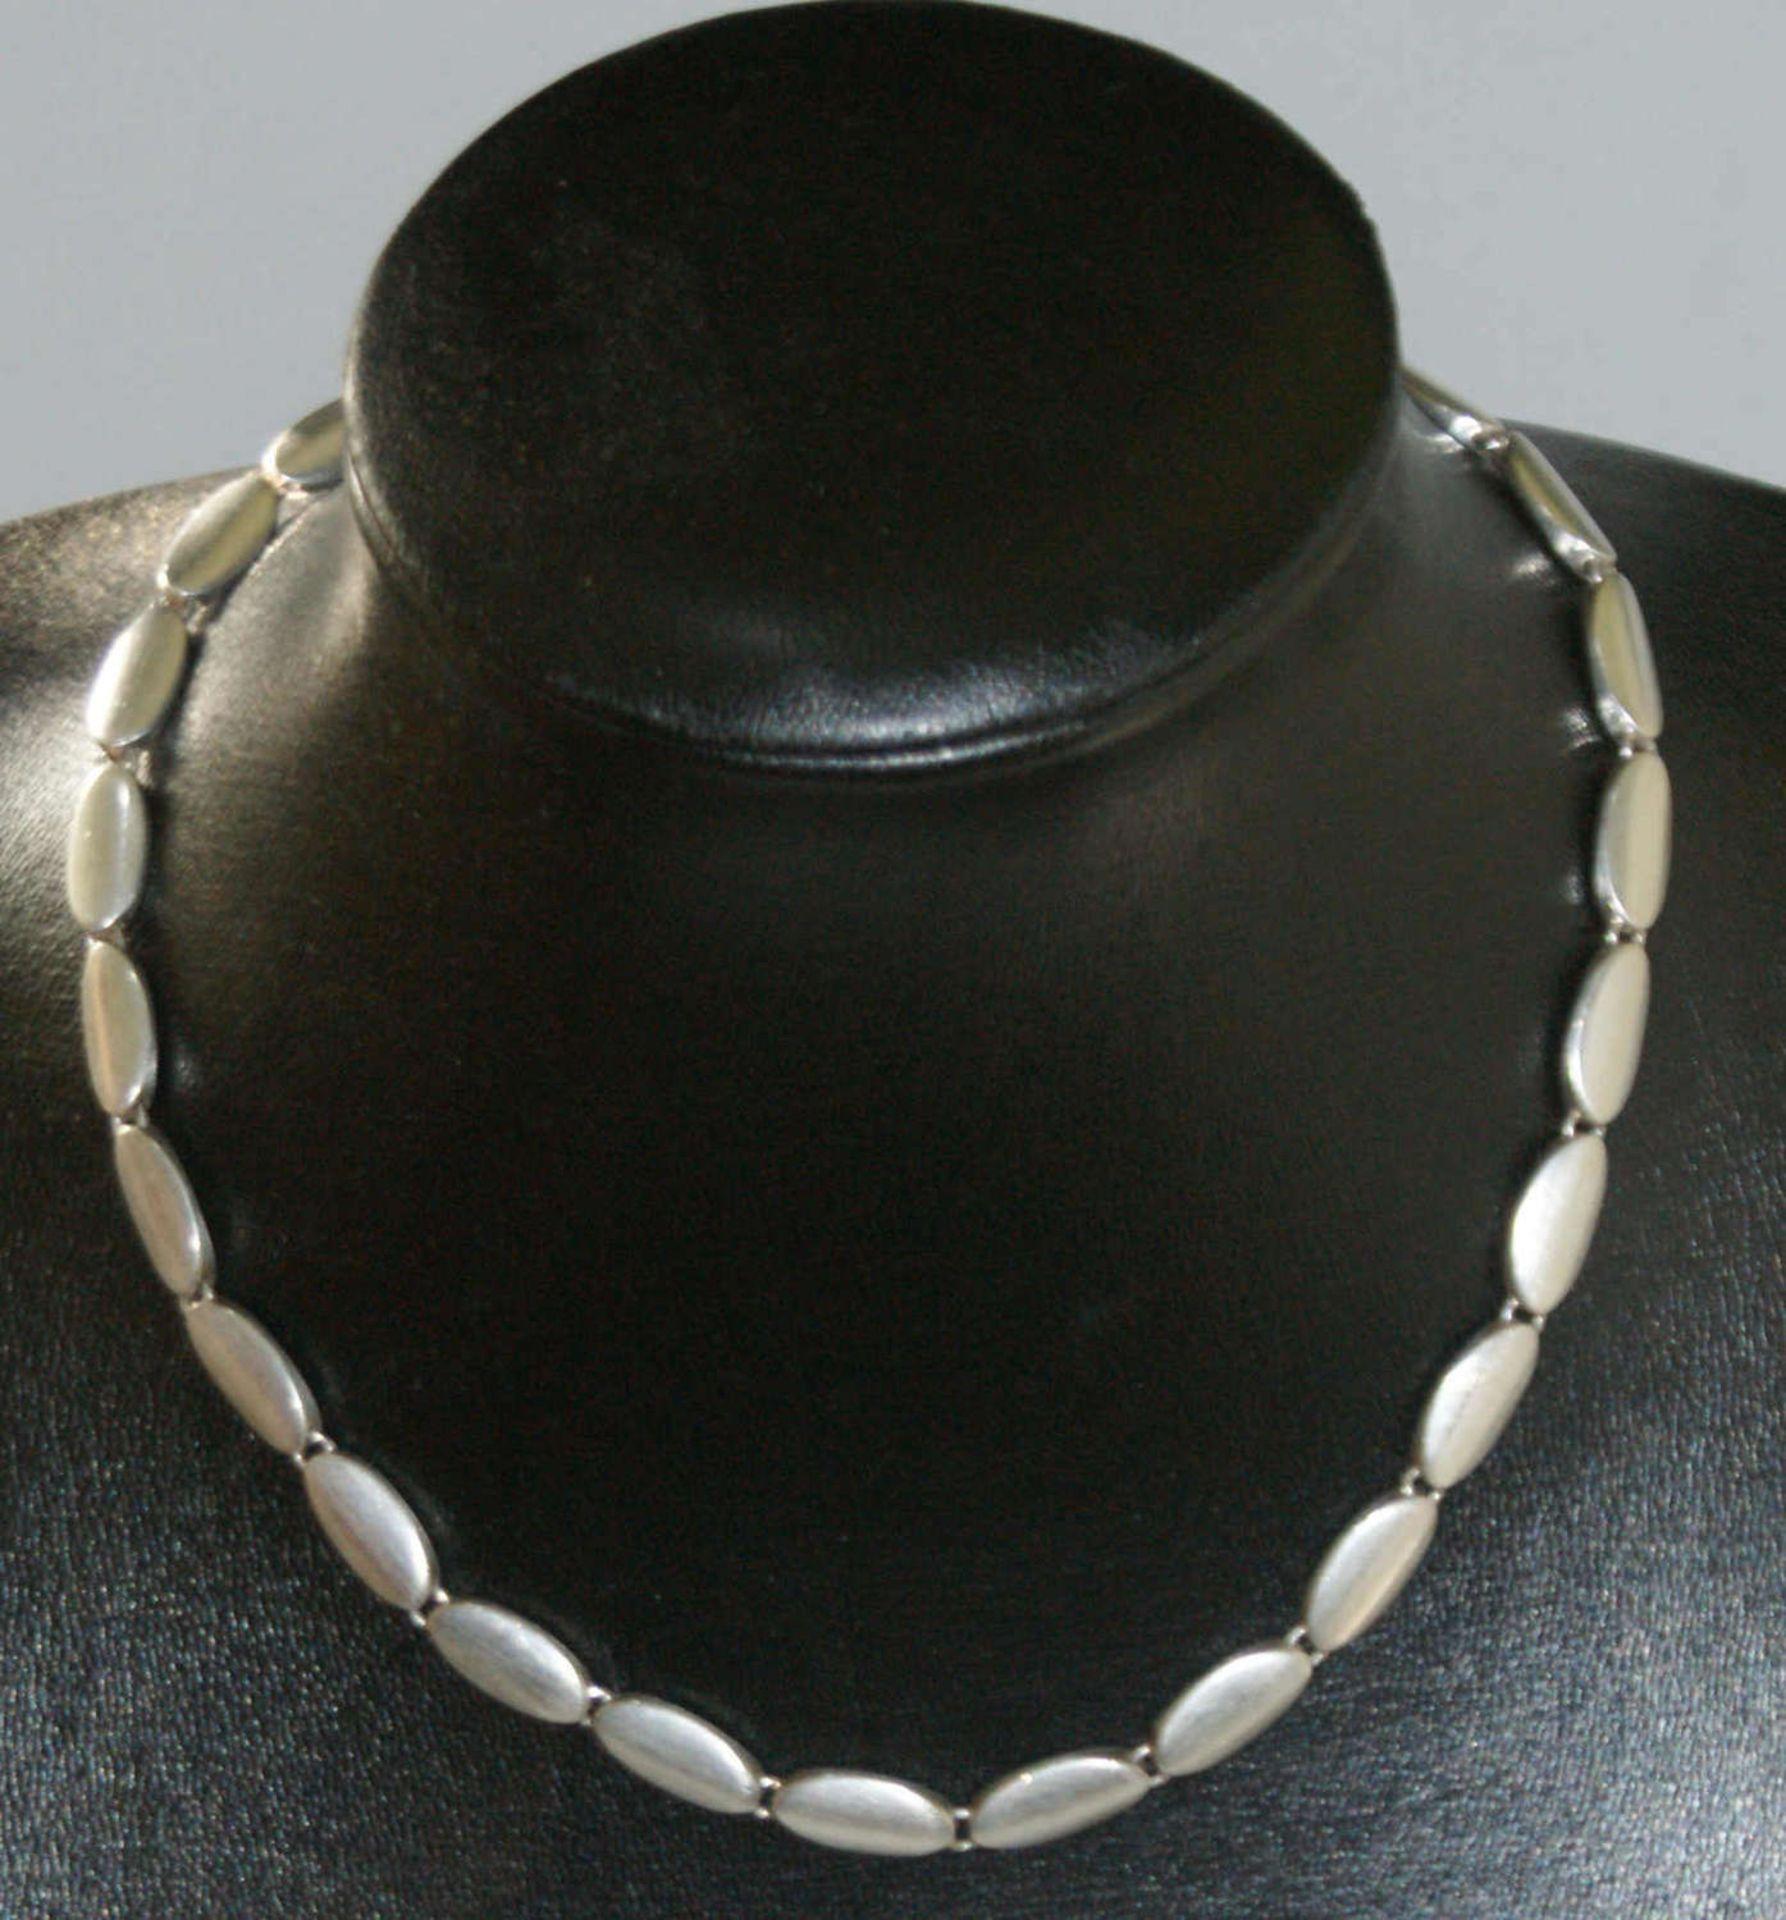 Fossil-Kette, 925er Silber, Länge ca. 45 cm, Gewicht ca. 73 gr